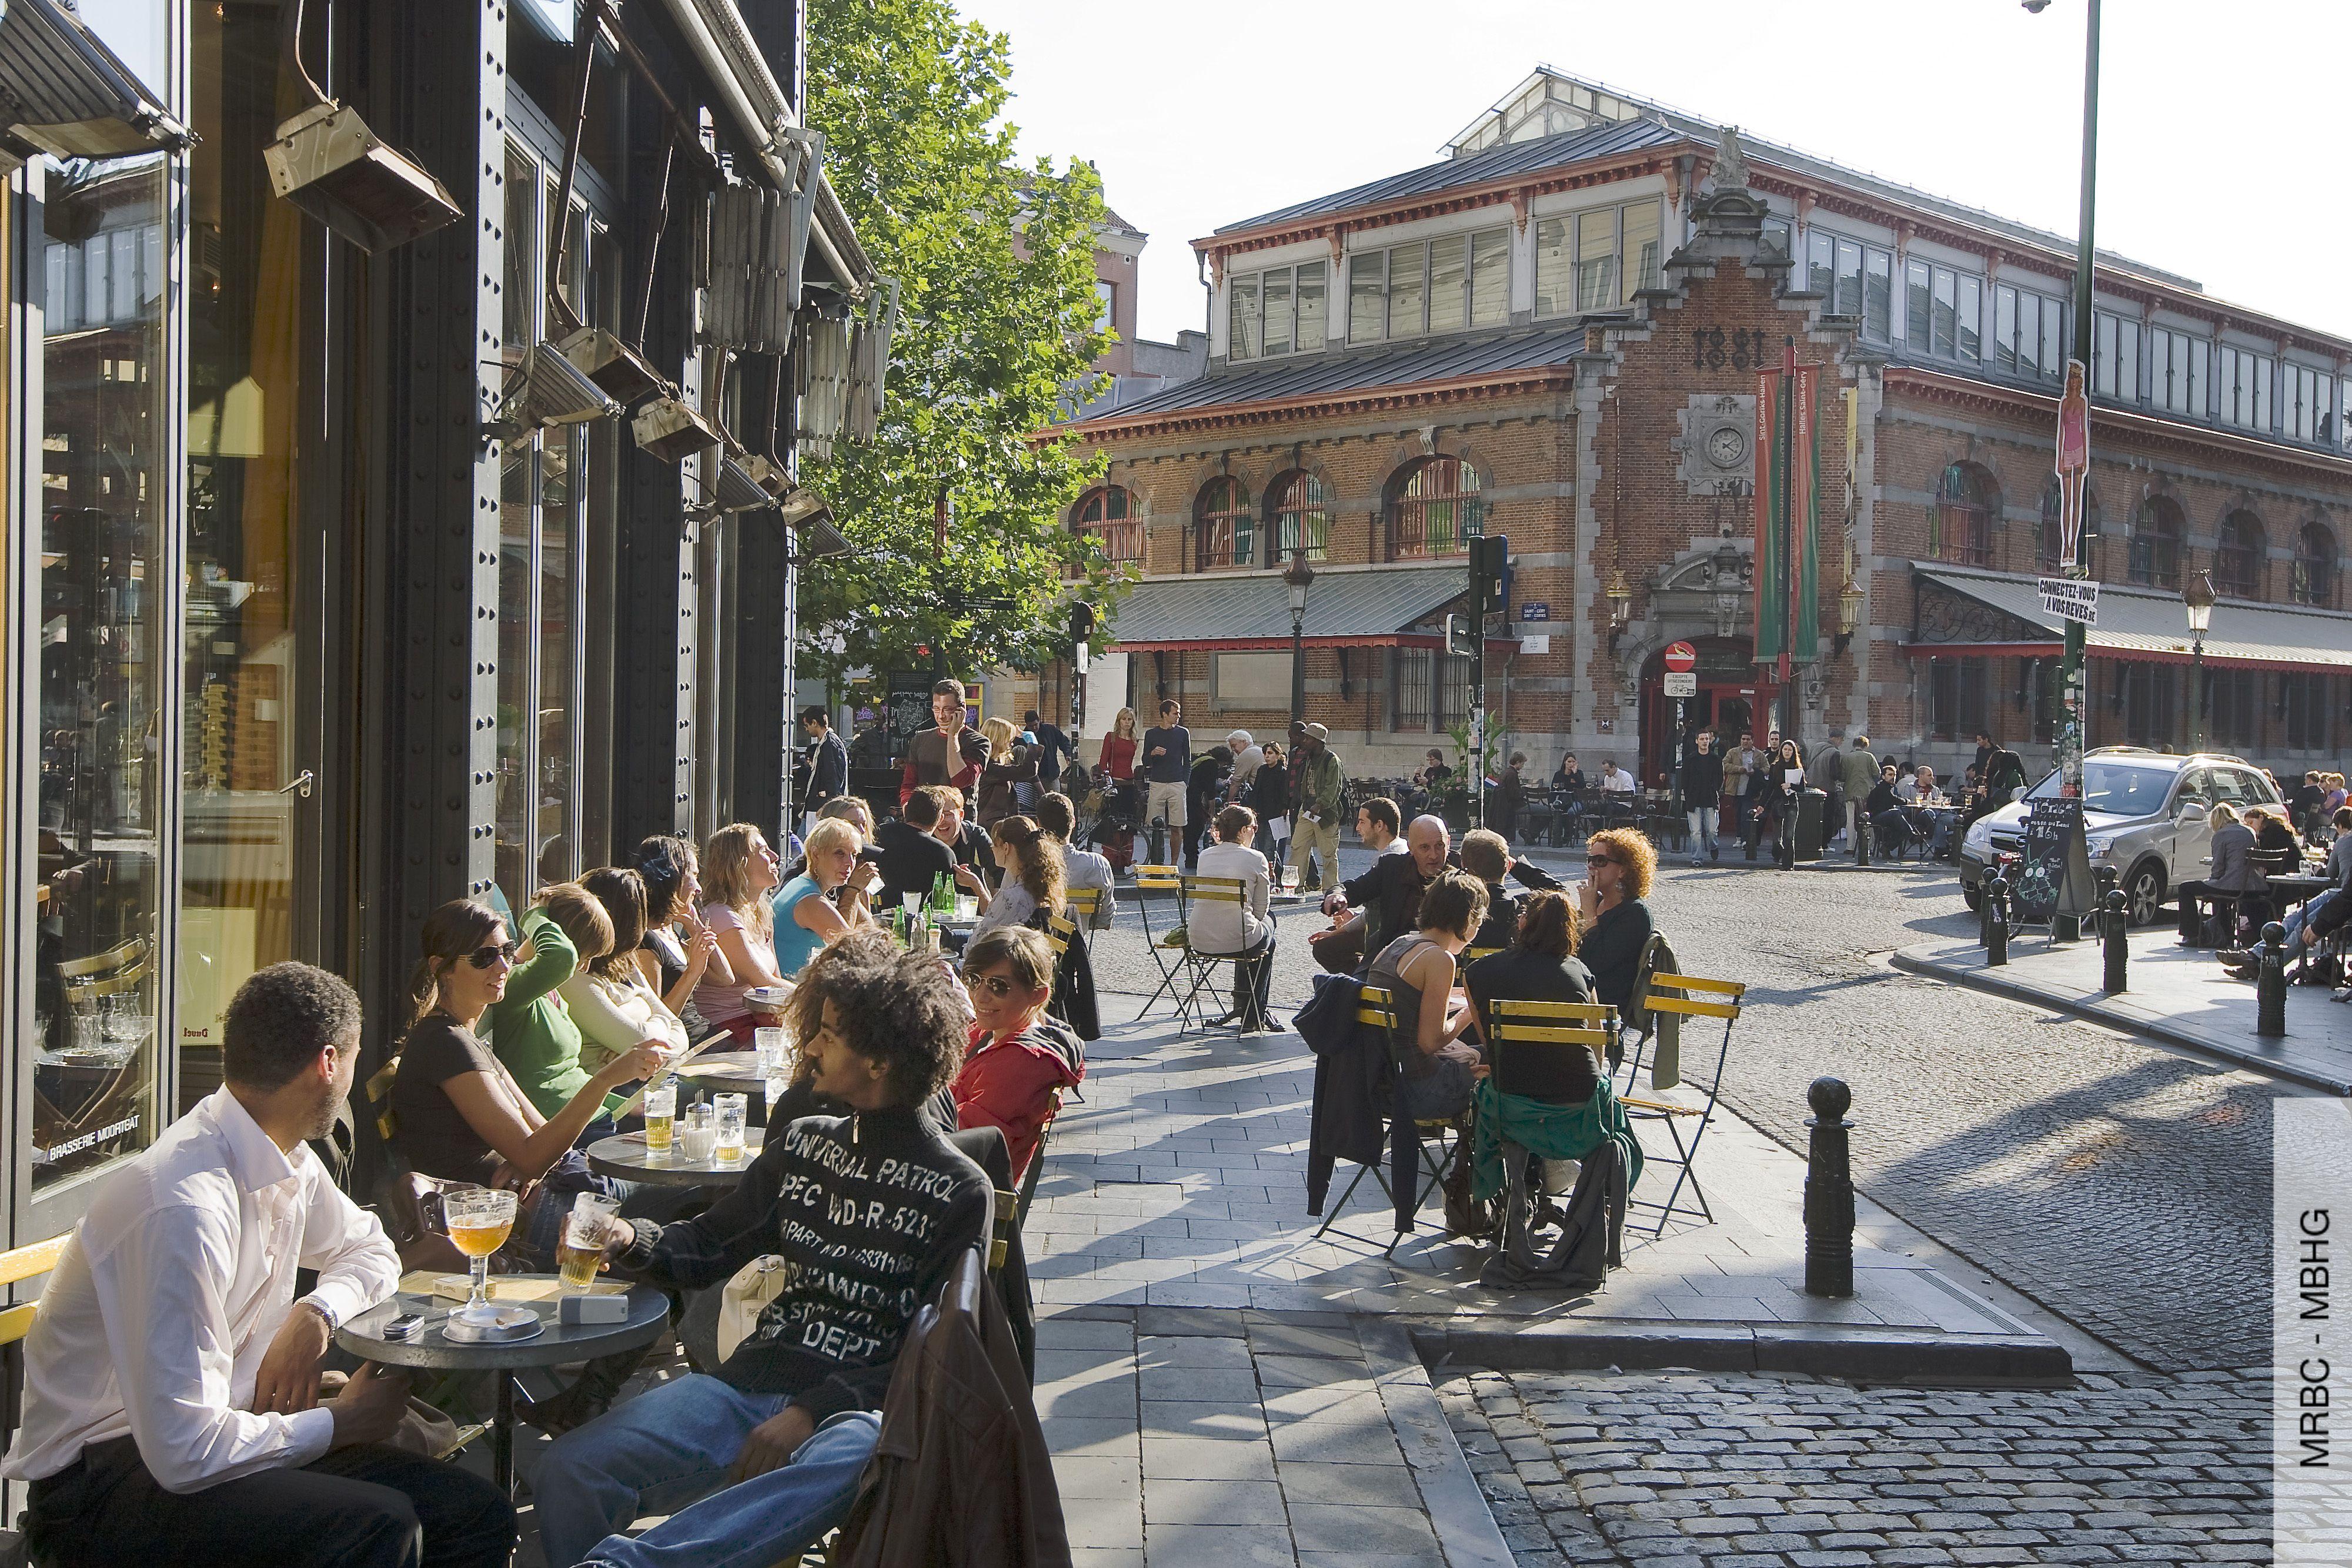 Halles Saint Gery Place Saint Gery 1 Bruxelles Sint Gorikshallen Sint Goriksplein 1 Brussel Belgie Nachtleven Brussel